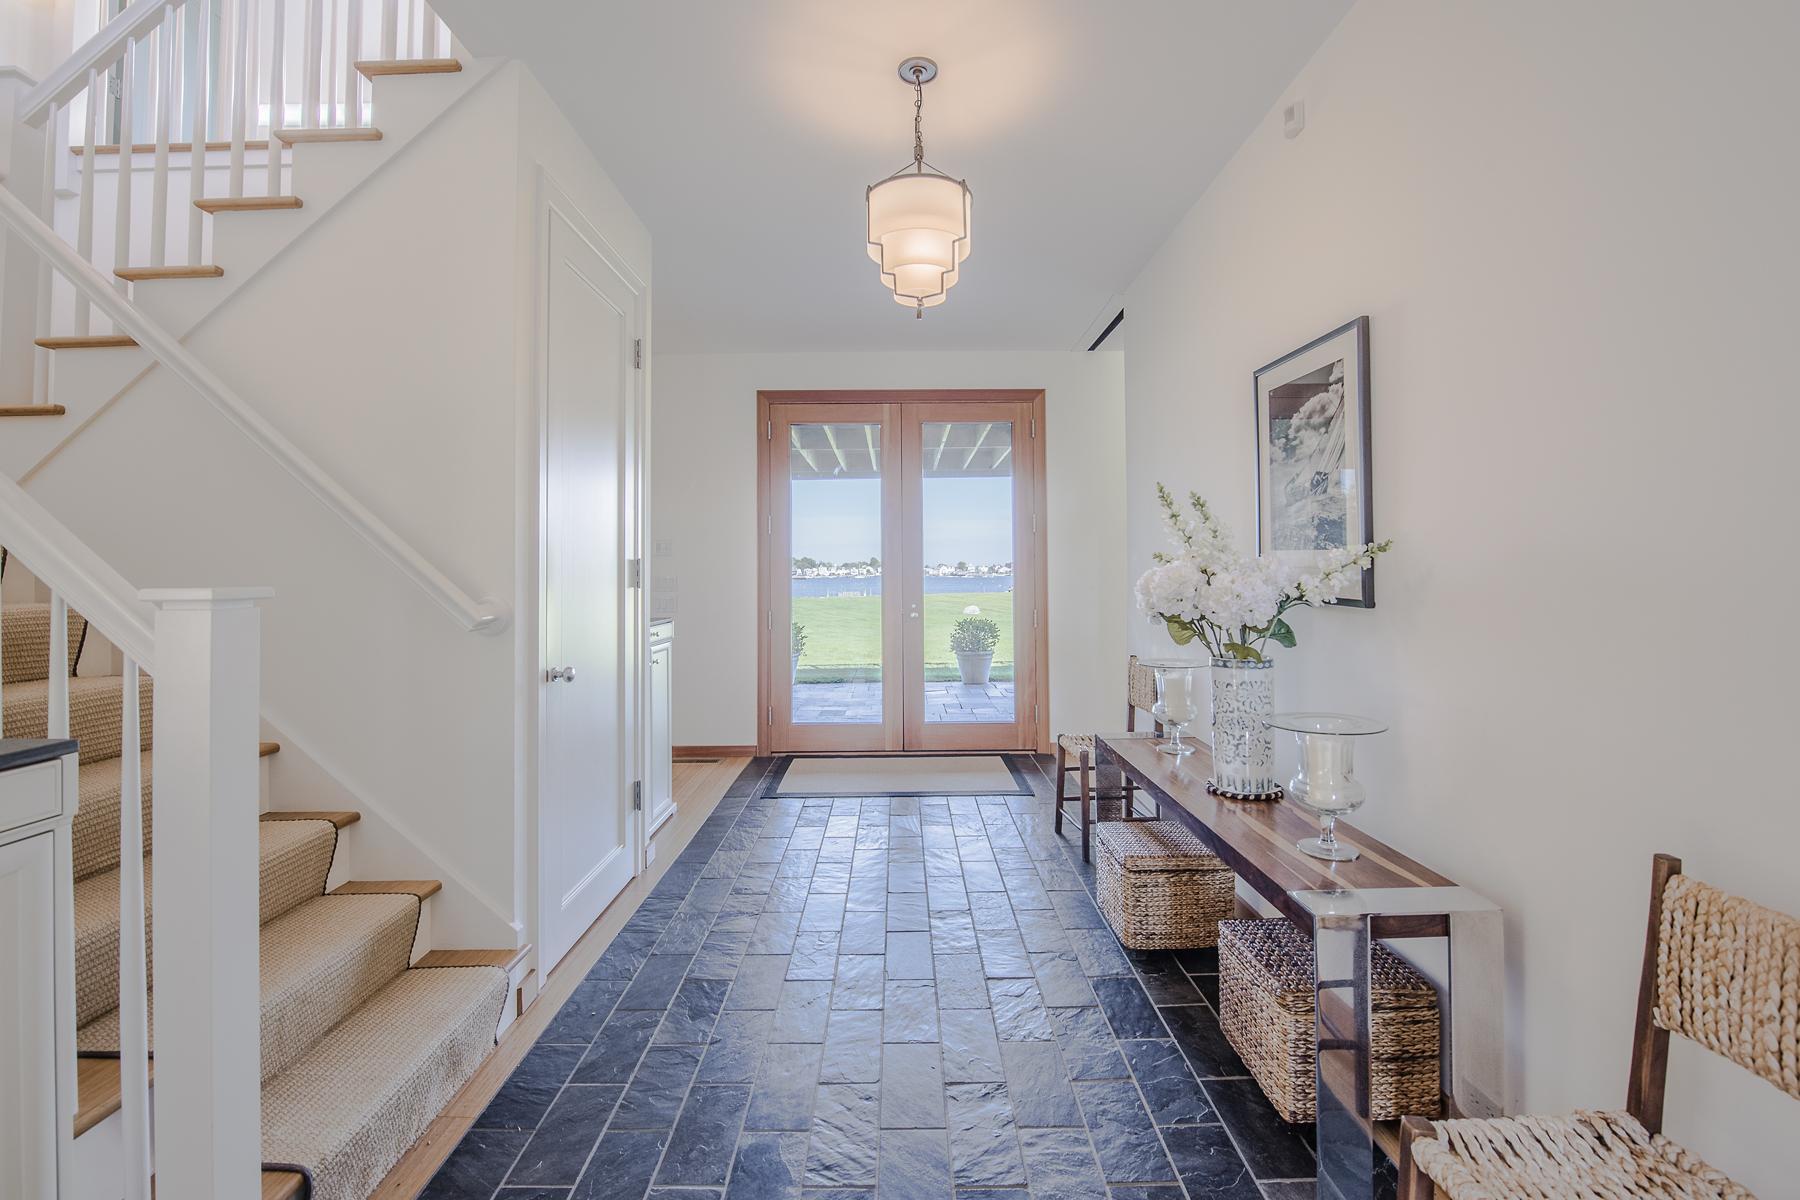 Additional photo for property listing at Weatherly 195 Wamphassuc Road Stonington, Connecticut 06378 United States